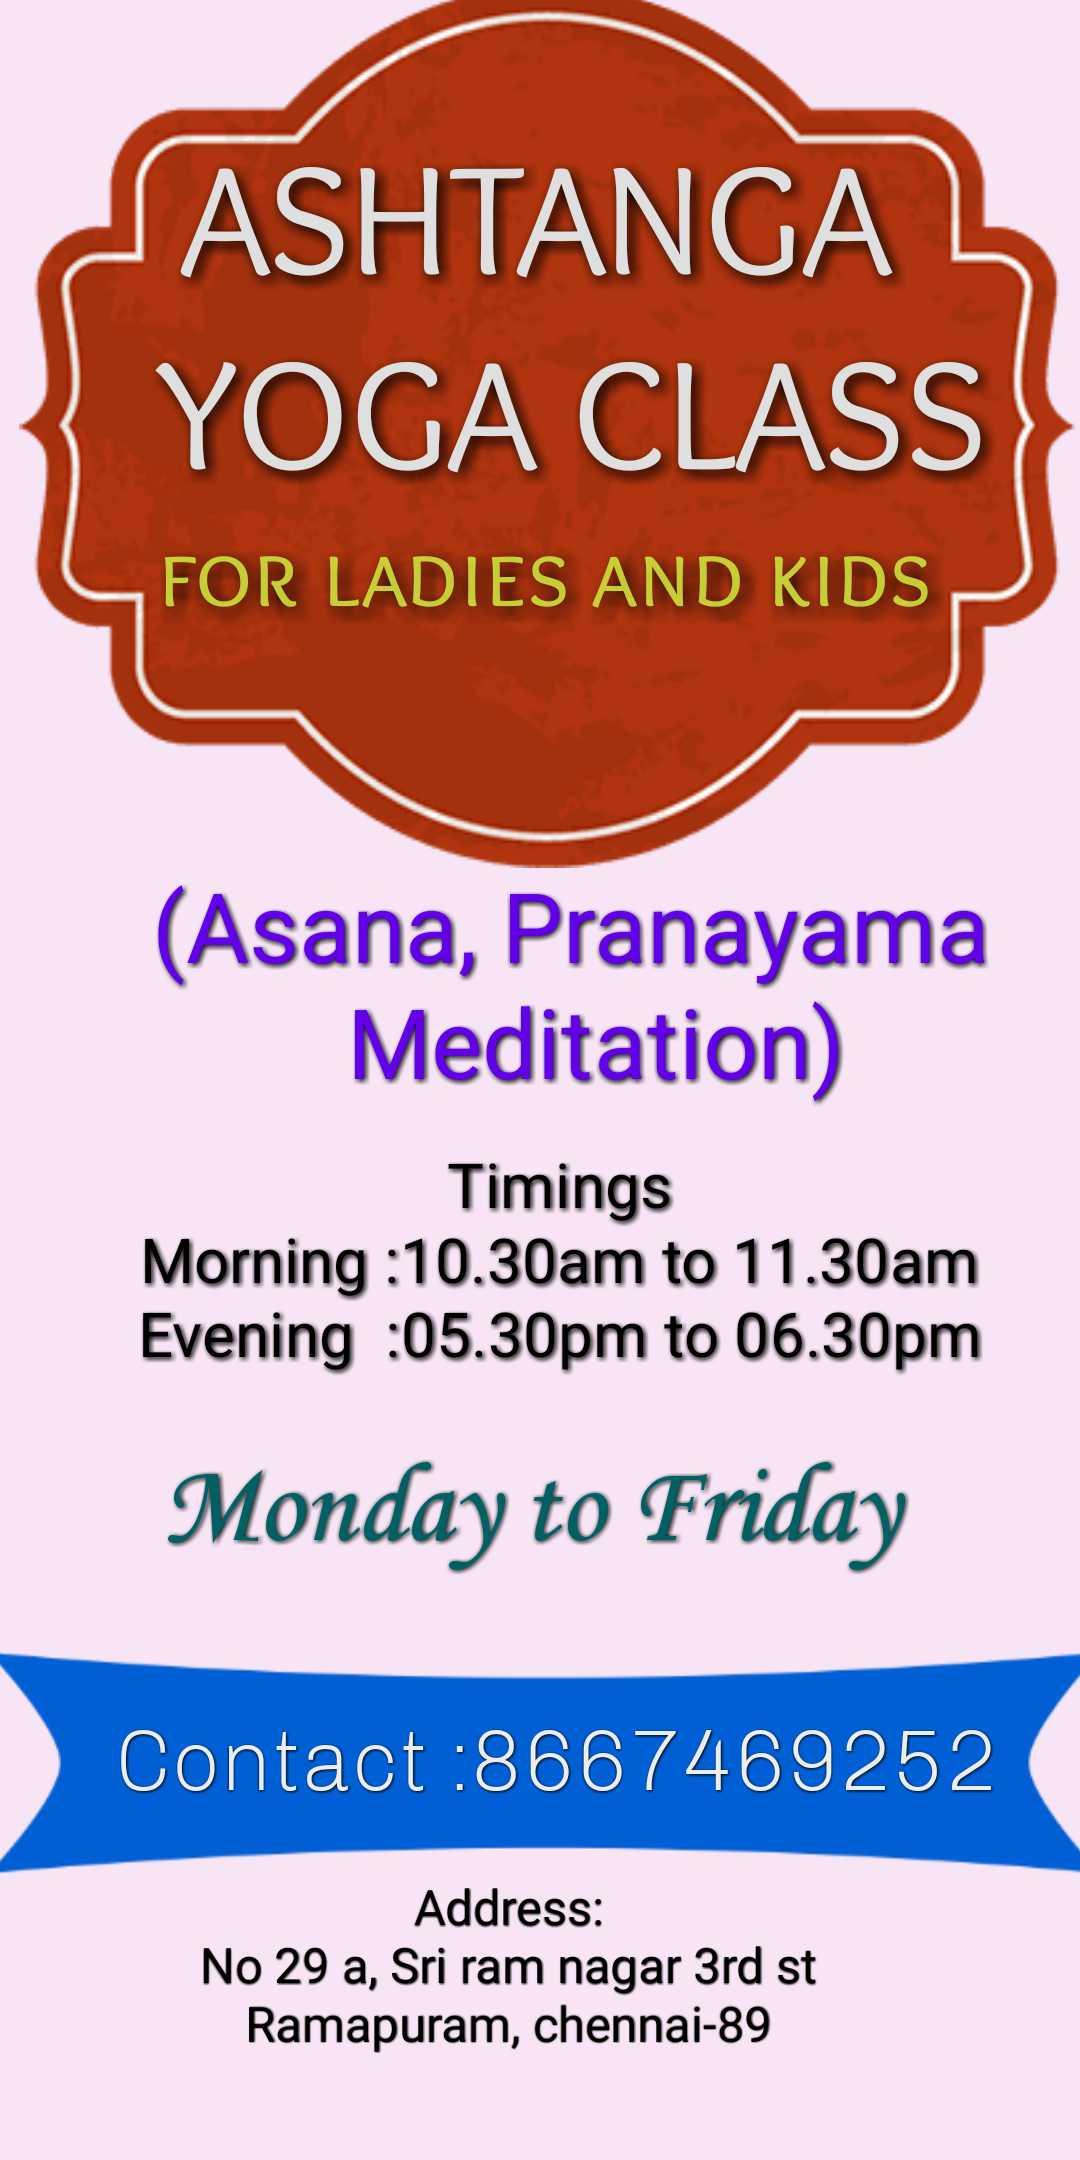 Ashtanga Yoga Near Me - Yoga For You